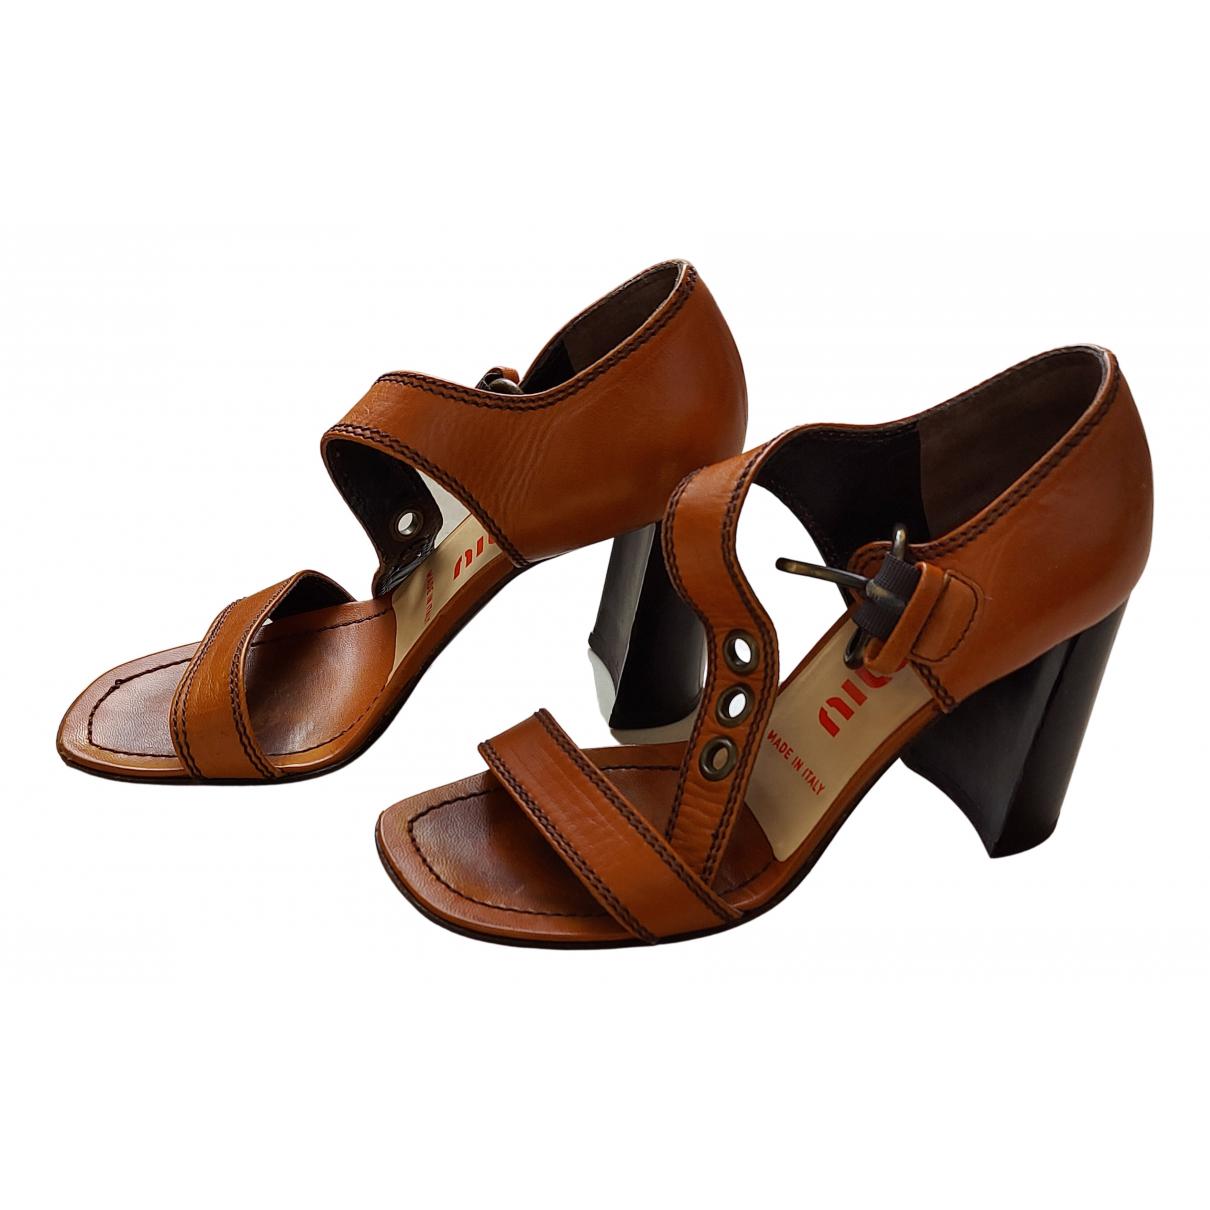 Miu Miu - Sandales   pour femme en cuir - marron